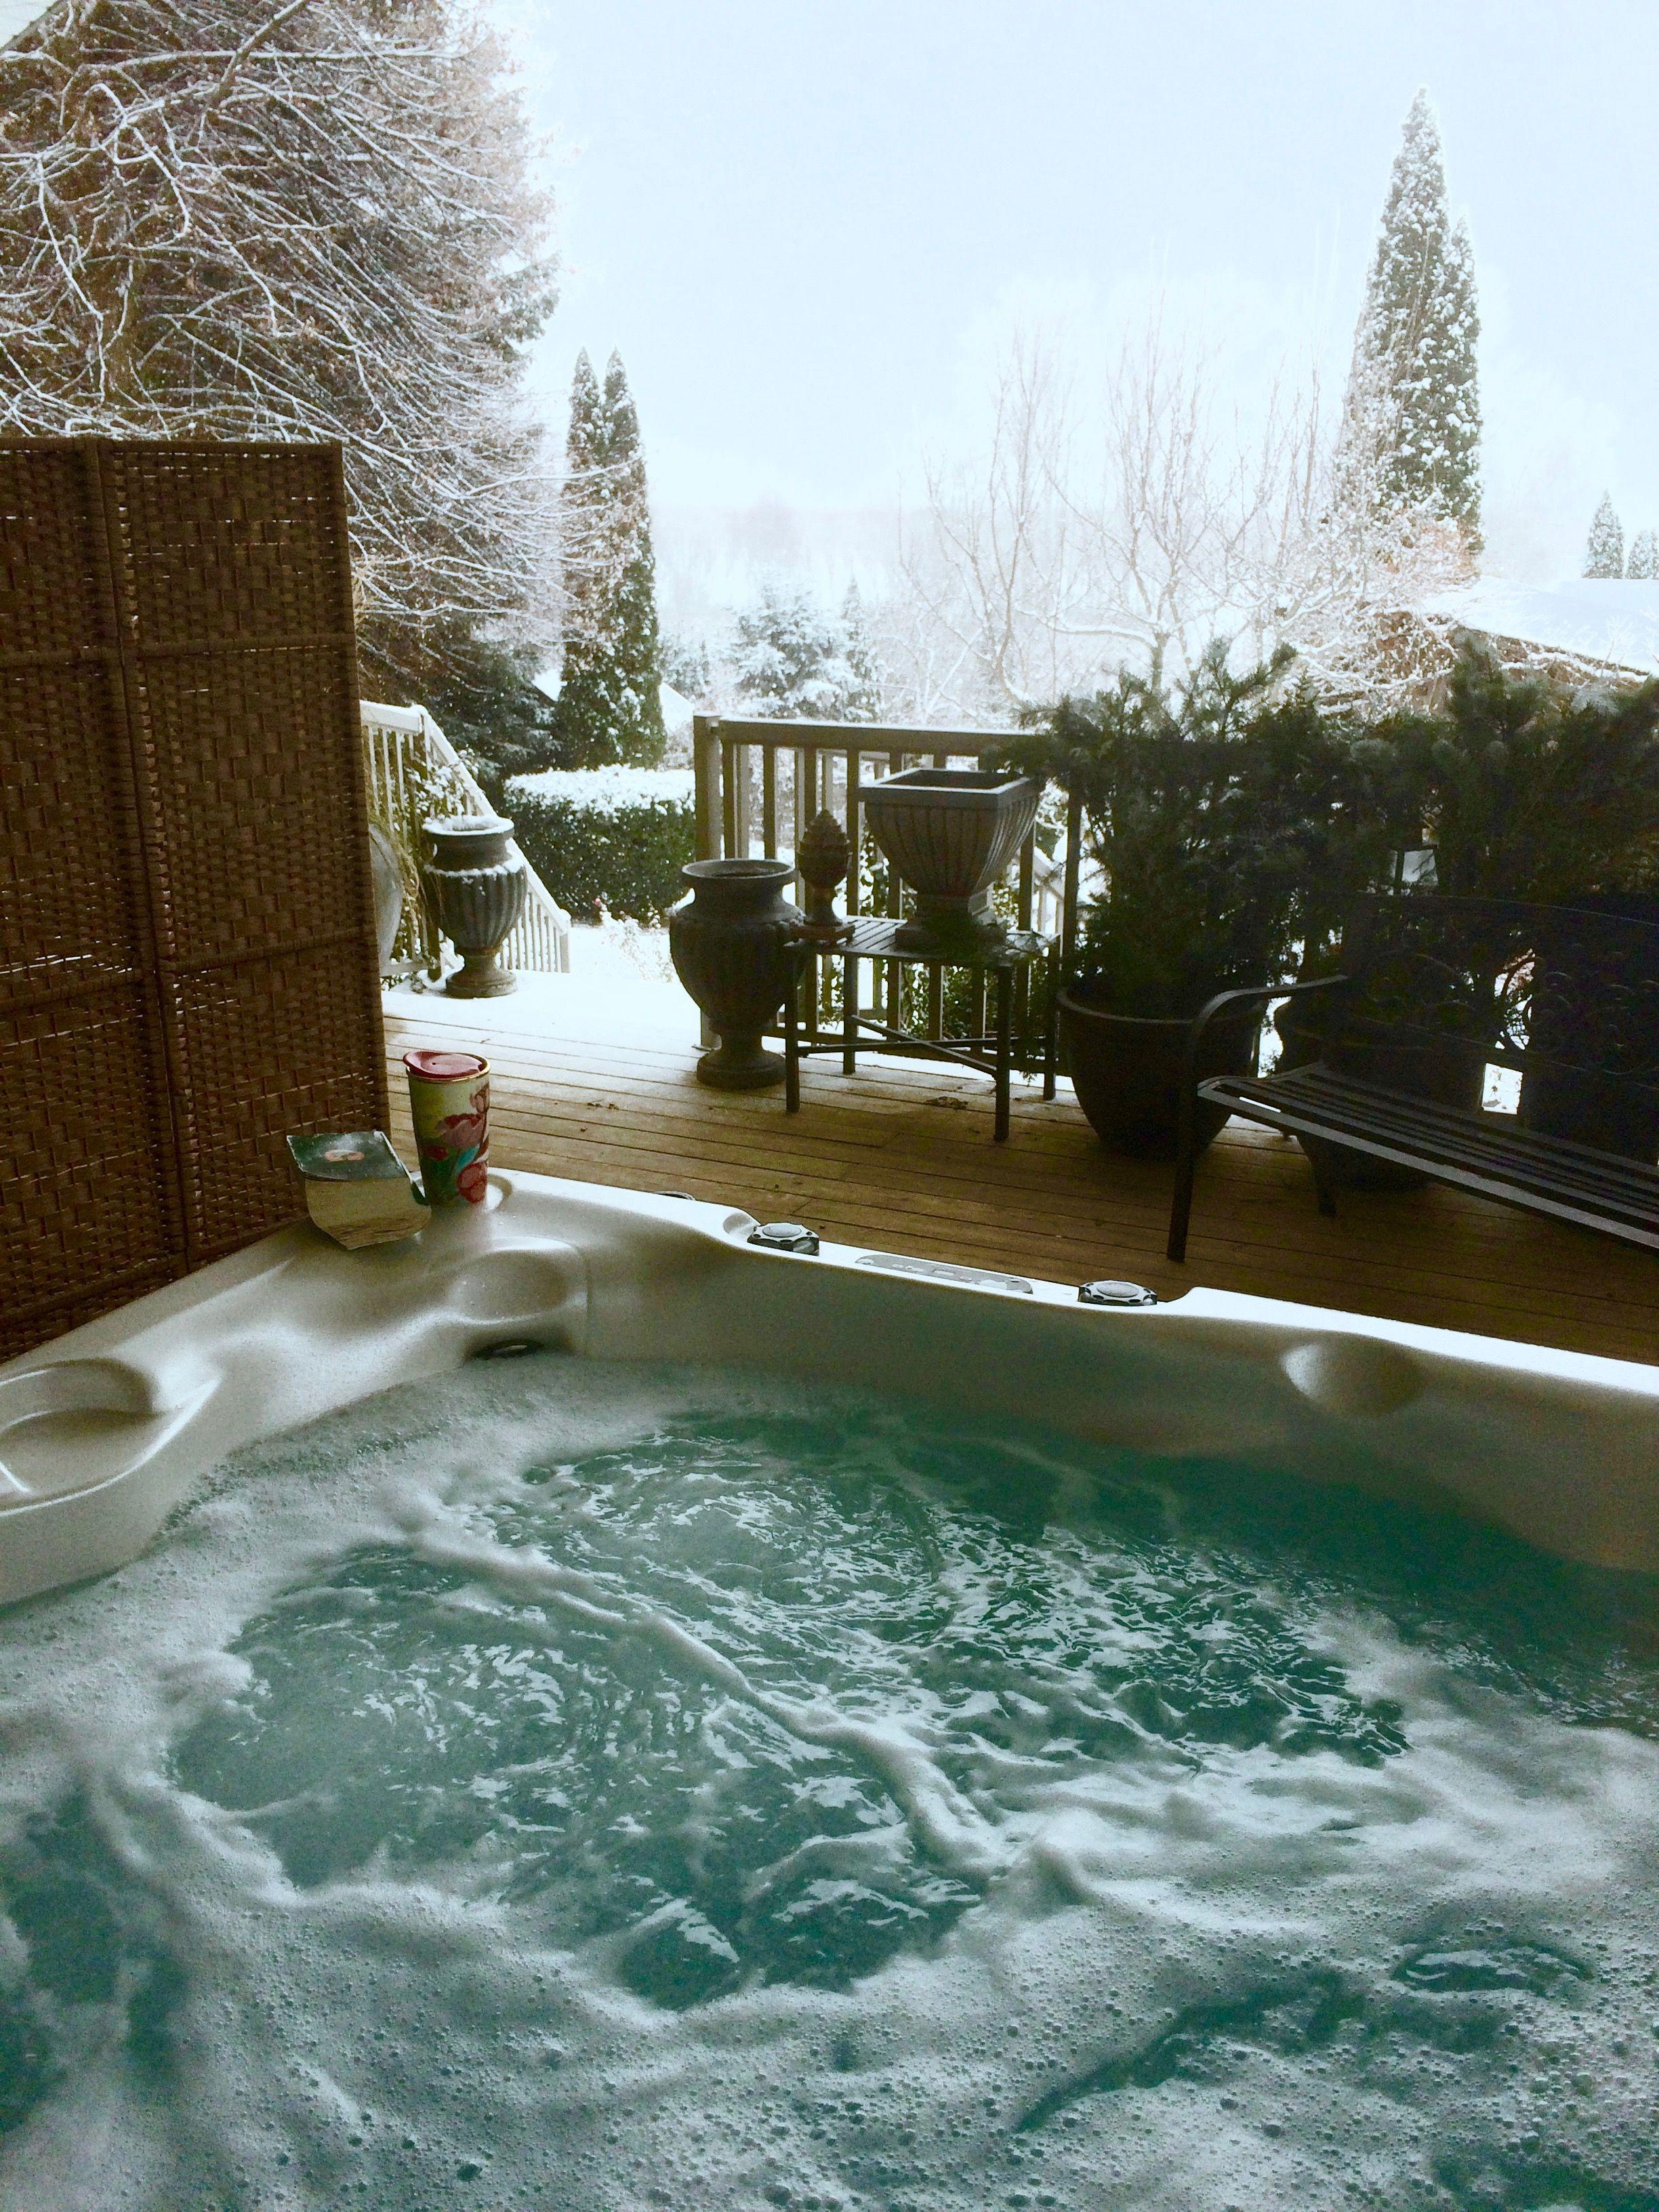 Winter Beachcomber Hot Tub Shot Beachcomberhottubs Hottubs Outdoorliving Winter Hot Tub Hot Tub Designs Dream Backyard